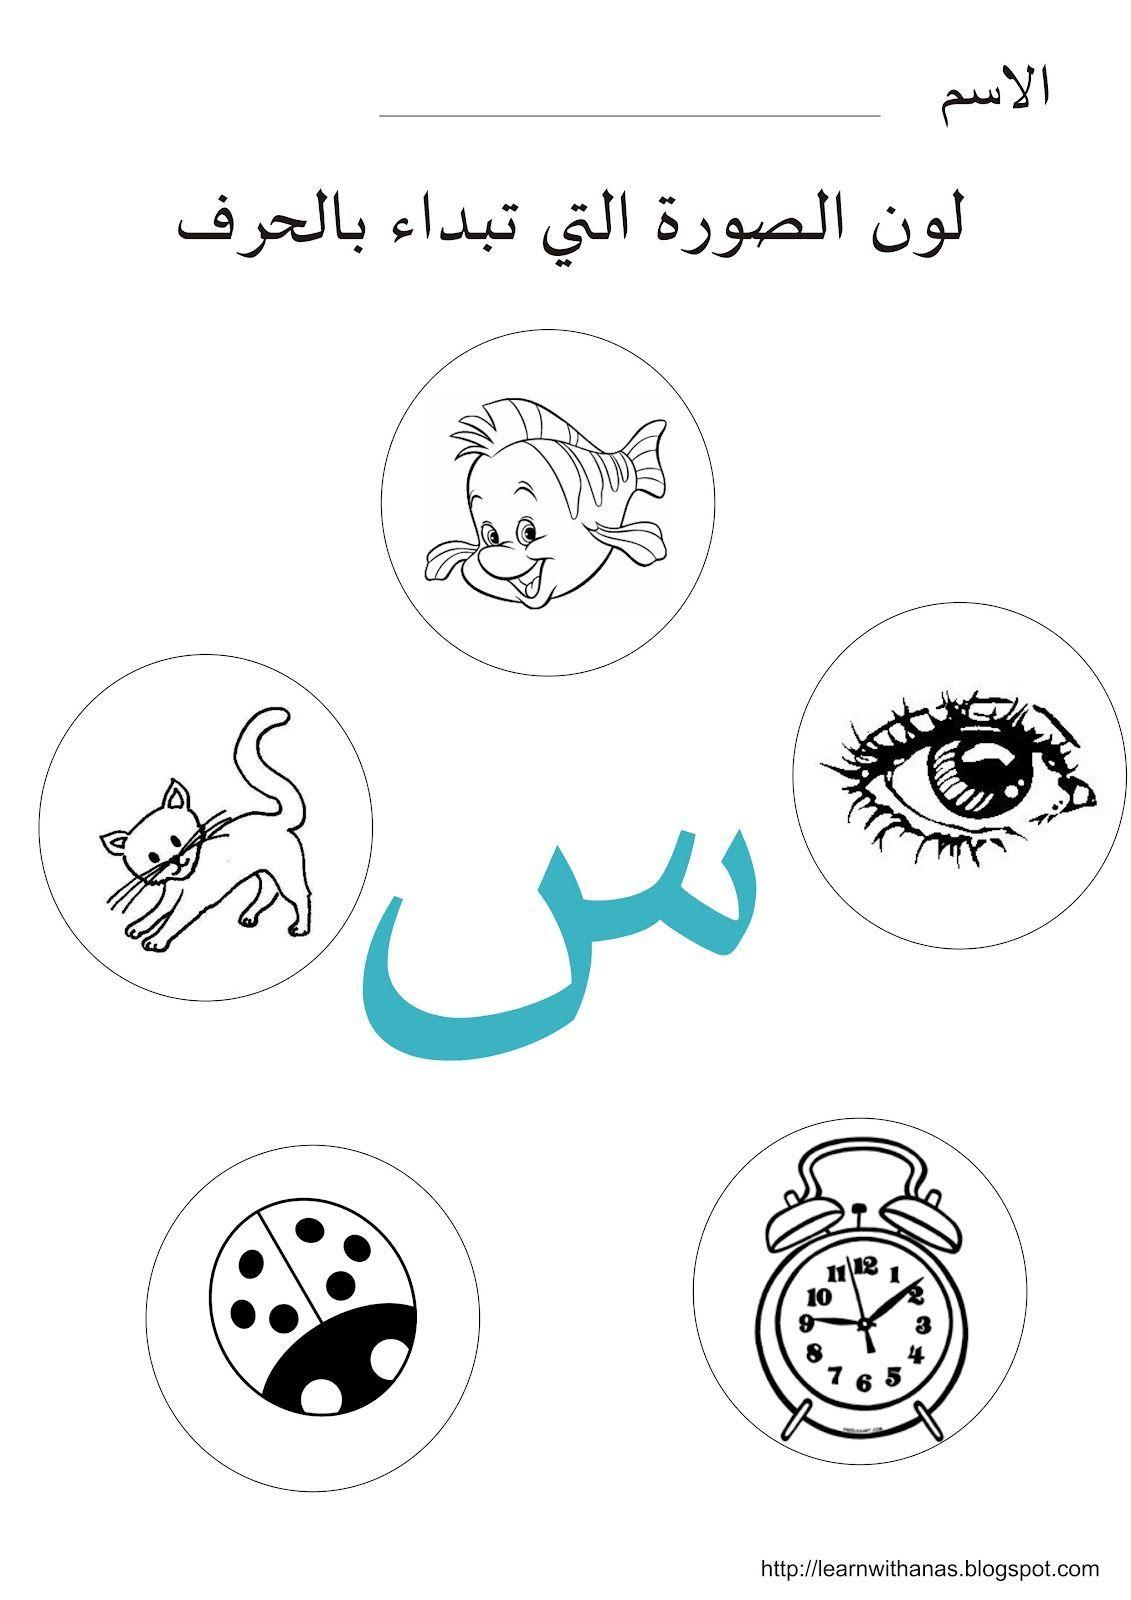 3 Preschool Worksheets Free Arabic U A U A A U U